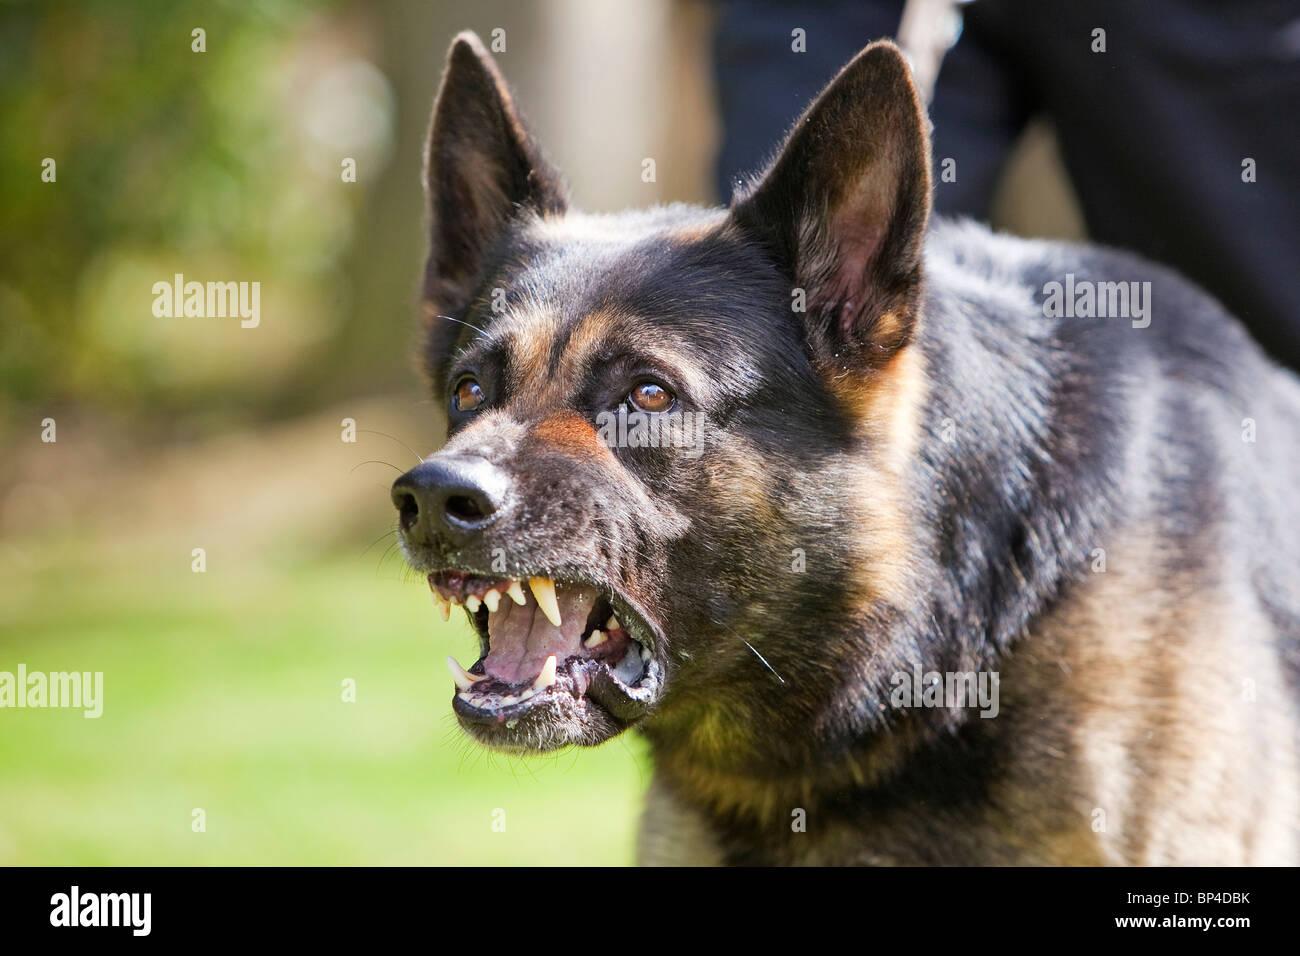 german shepherd growling - photo #13